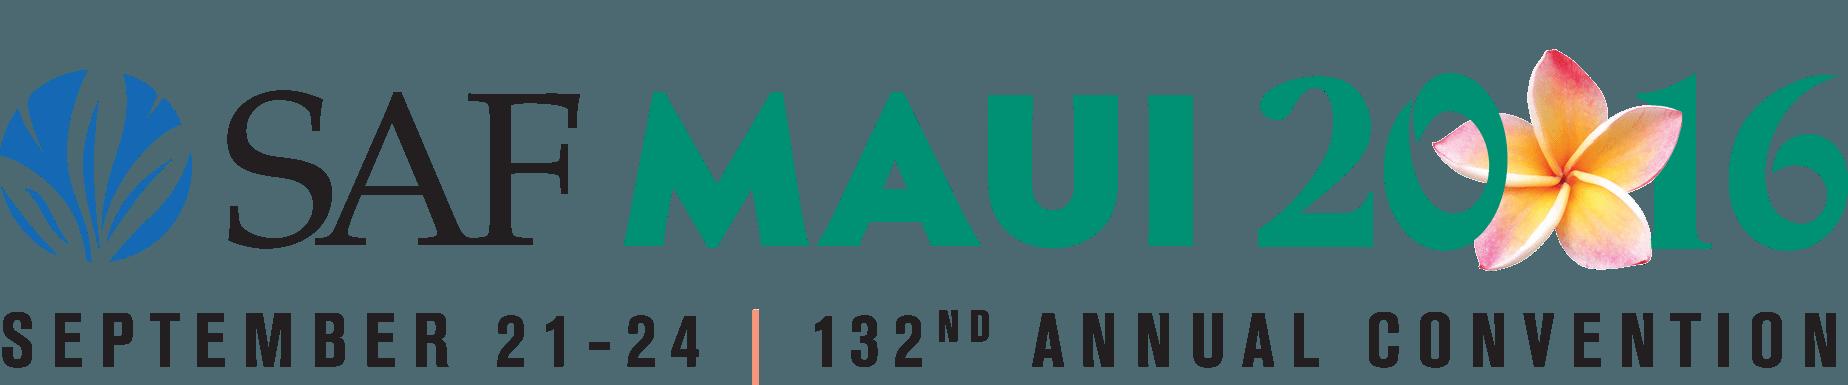 SAF Maui 2016